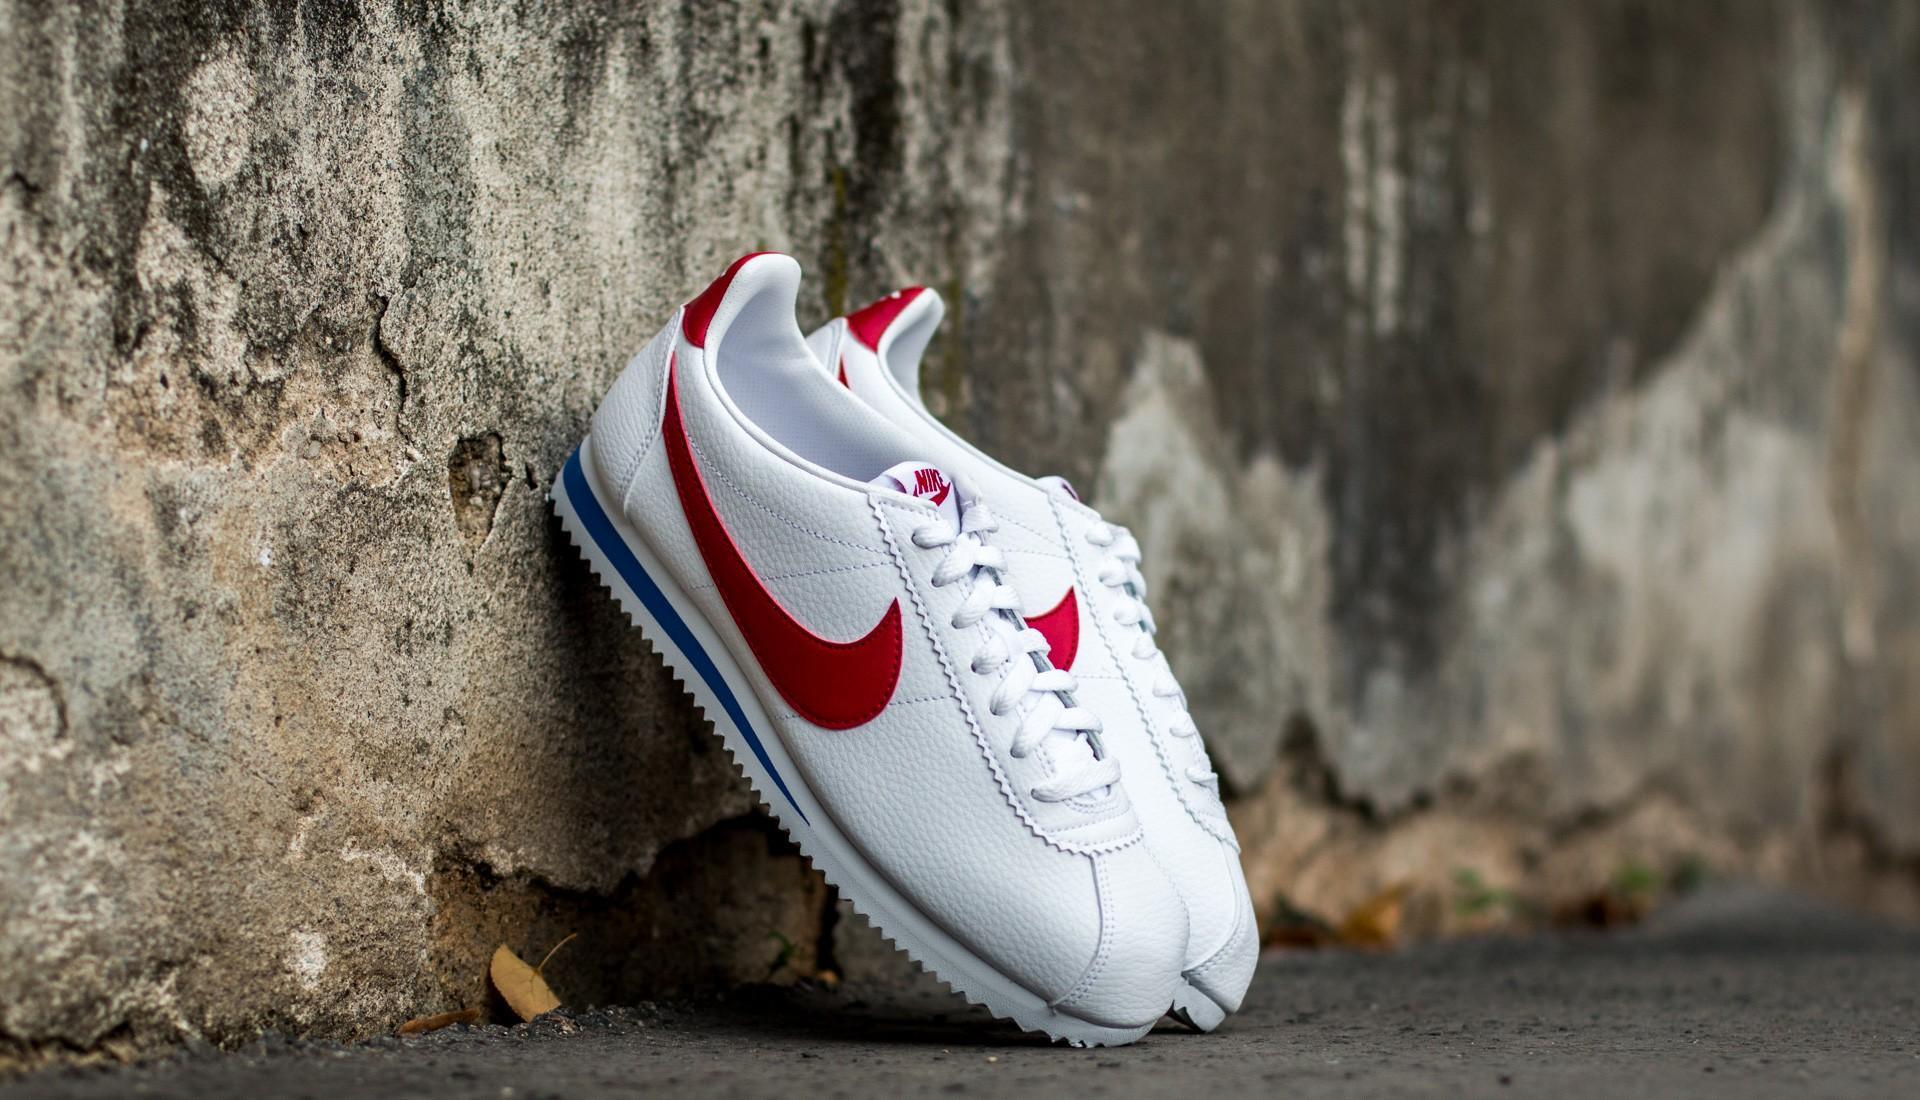 Nike Classic Cortez Leather White/ Varsity Red-Varsity Royal